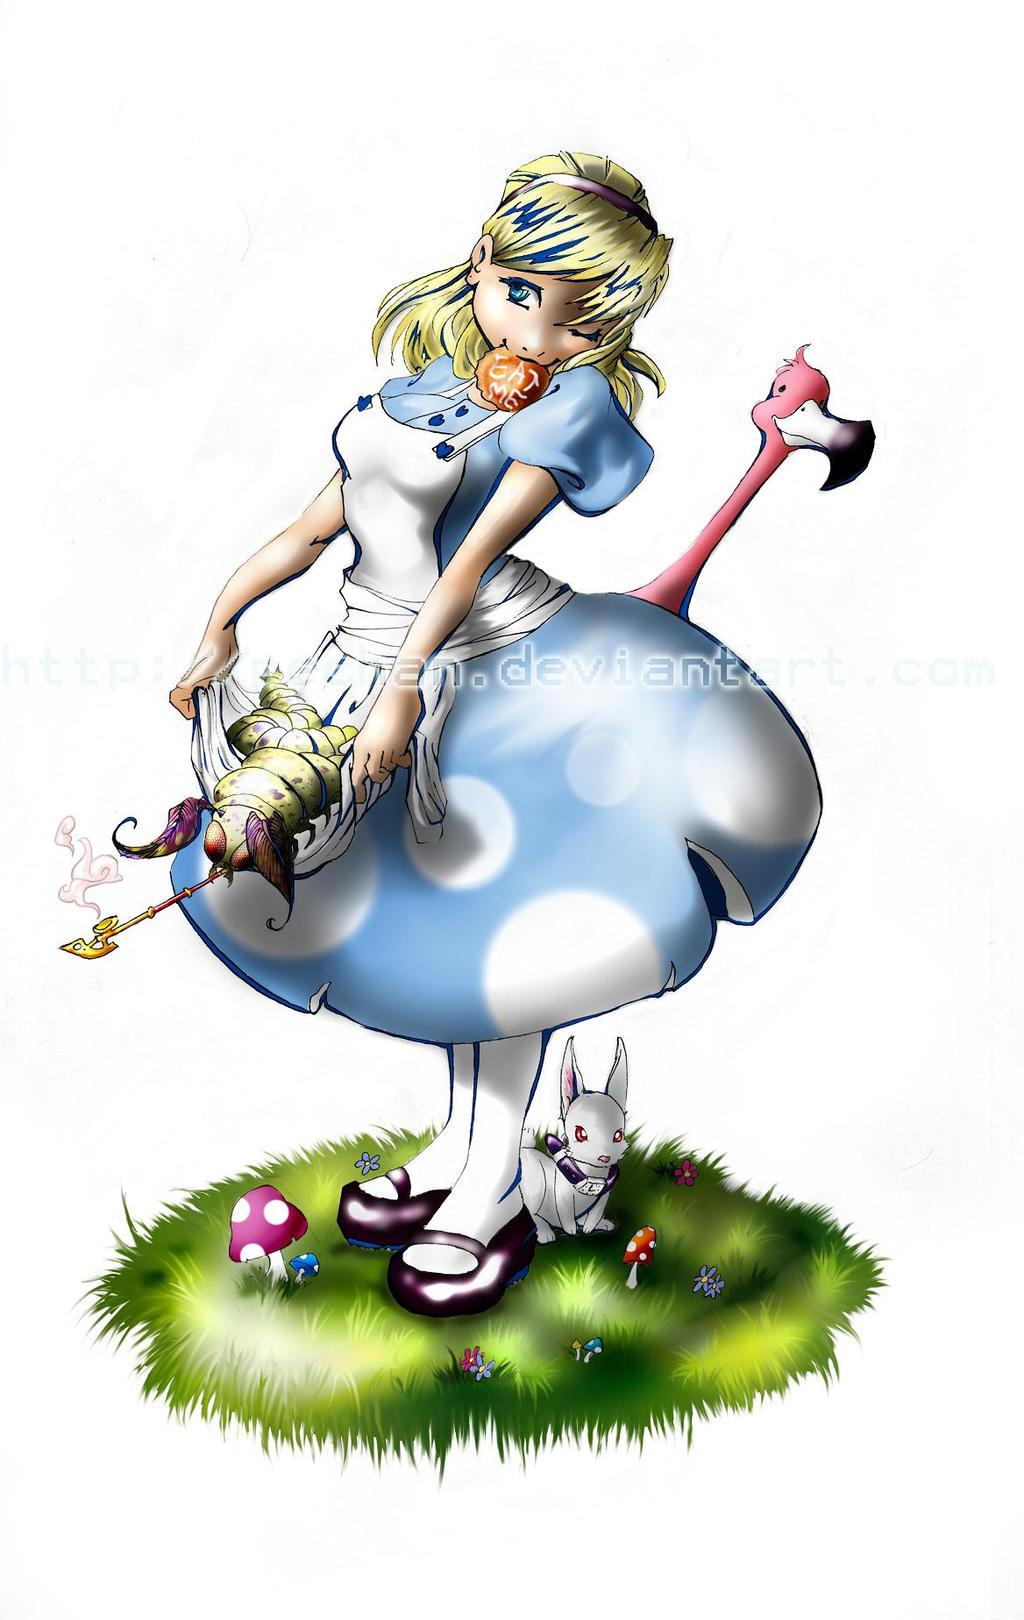 Alice is Wonderland by Pechan